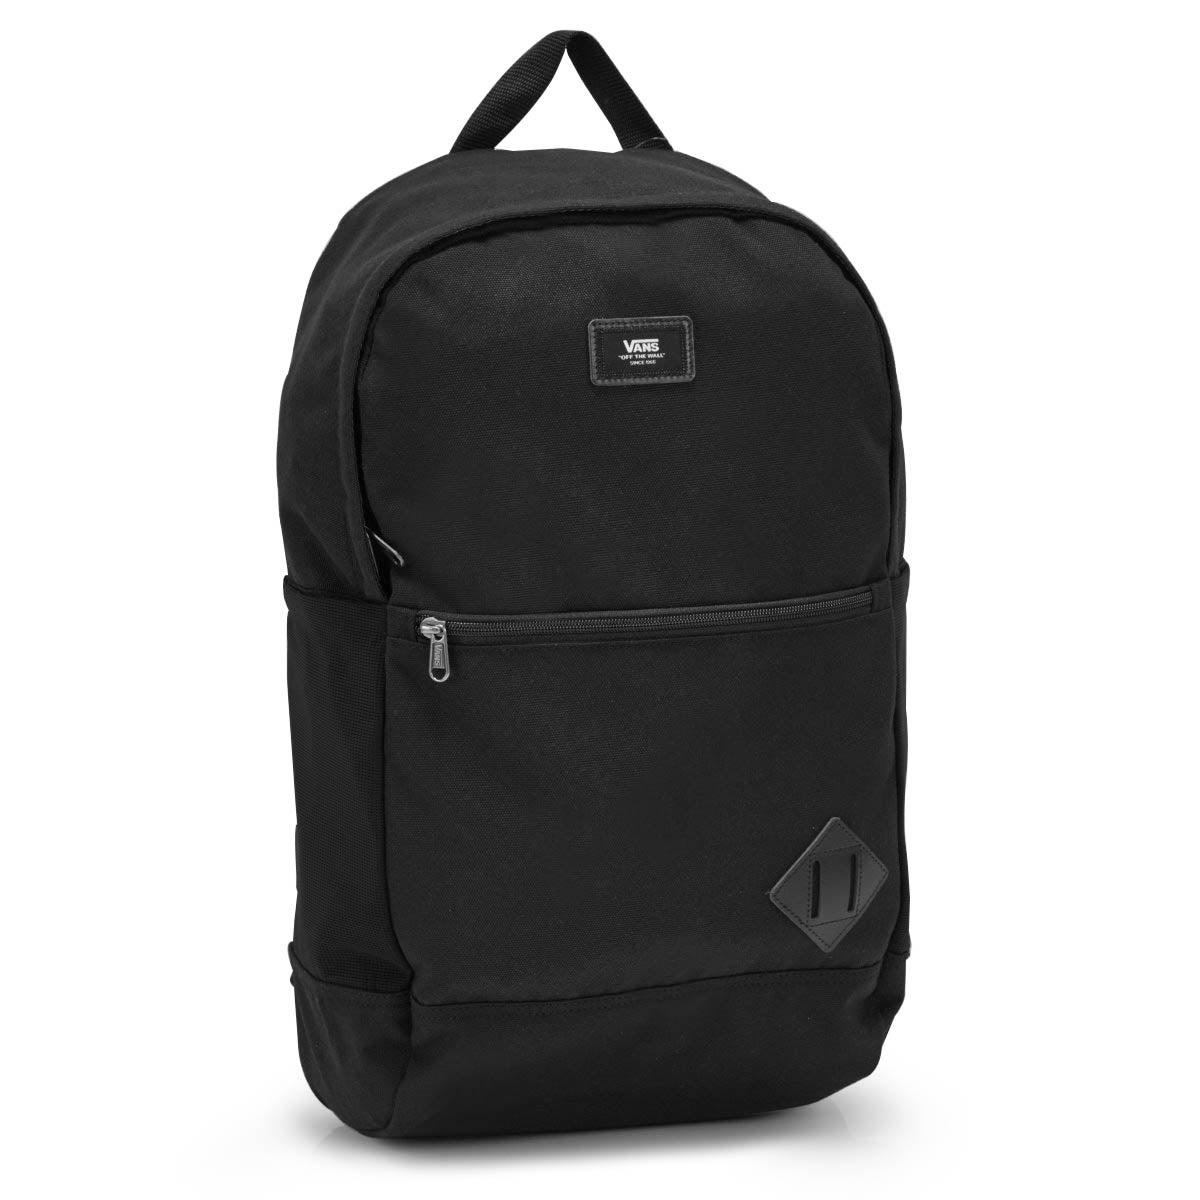 9ed1bb2e5f2 Vans Unisex VAN DOREN III black backpack | Softmoc.com